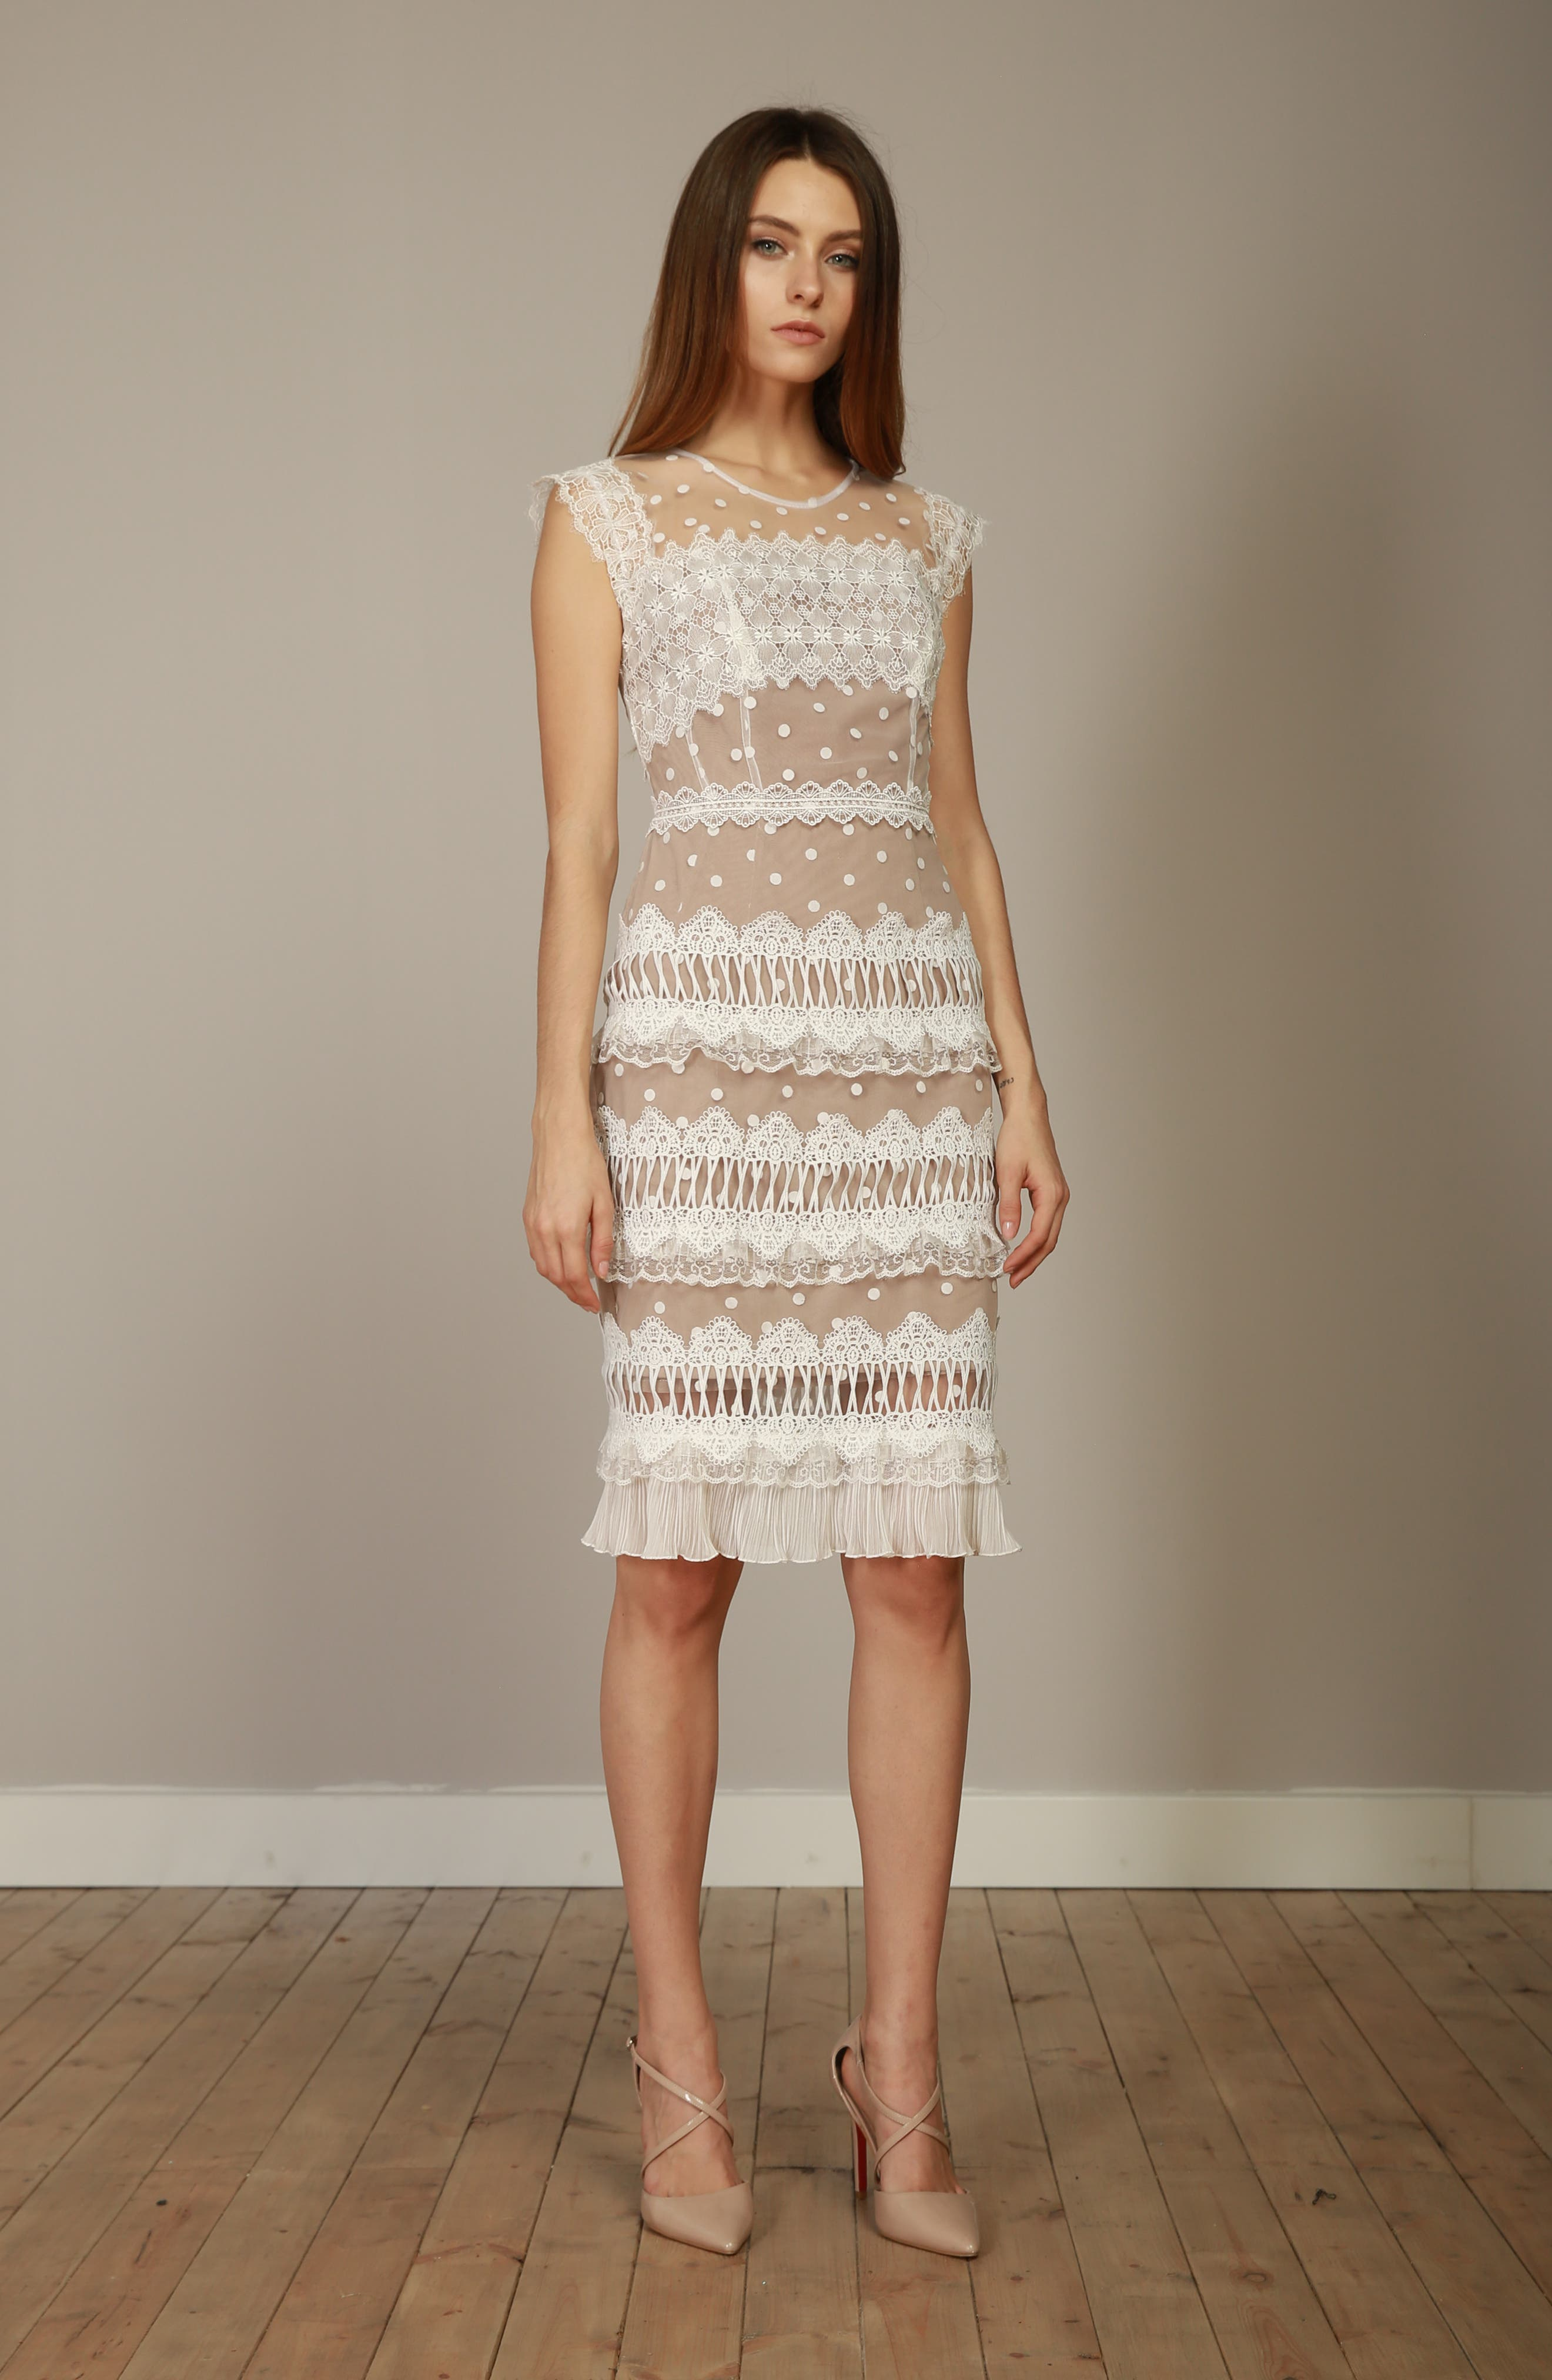 Majiorca Dot Lace Cocktail Dress,                             Alternate thumbnail 7, color,                             WHITE